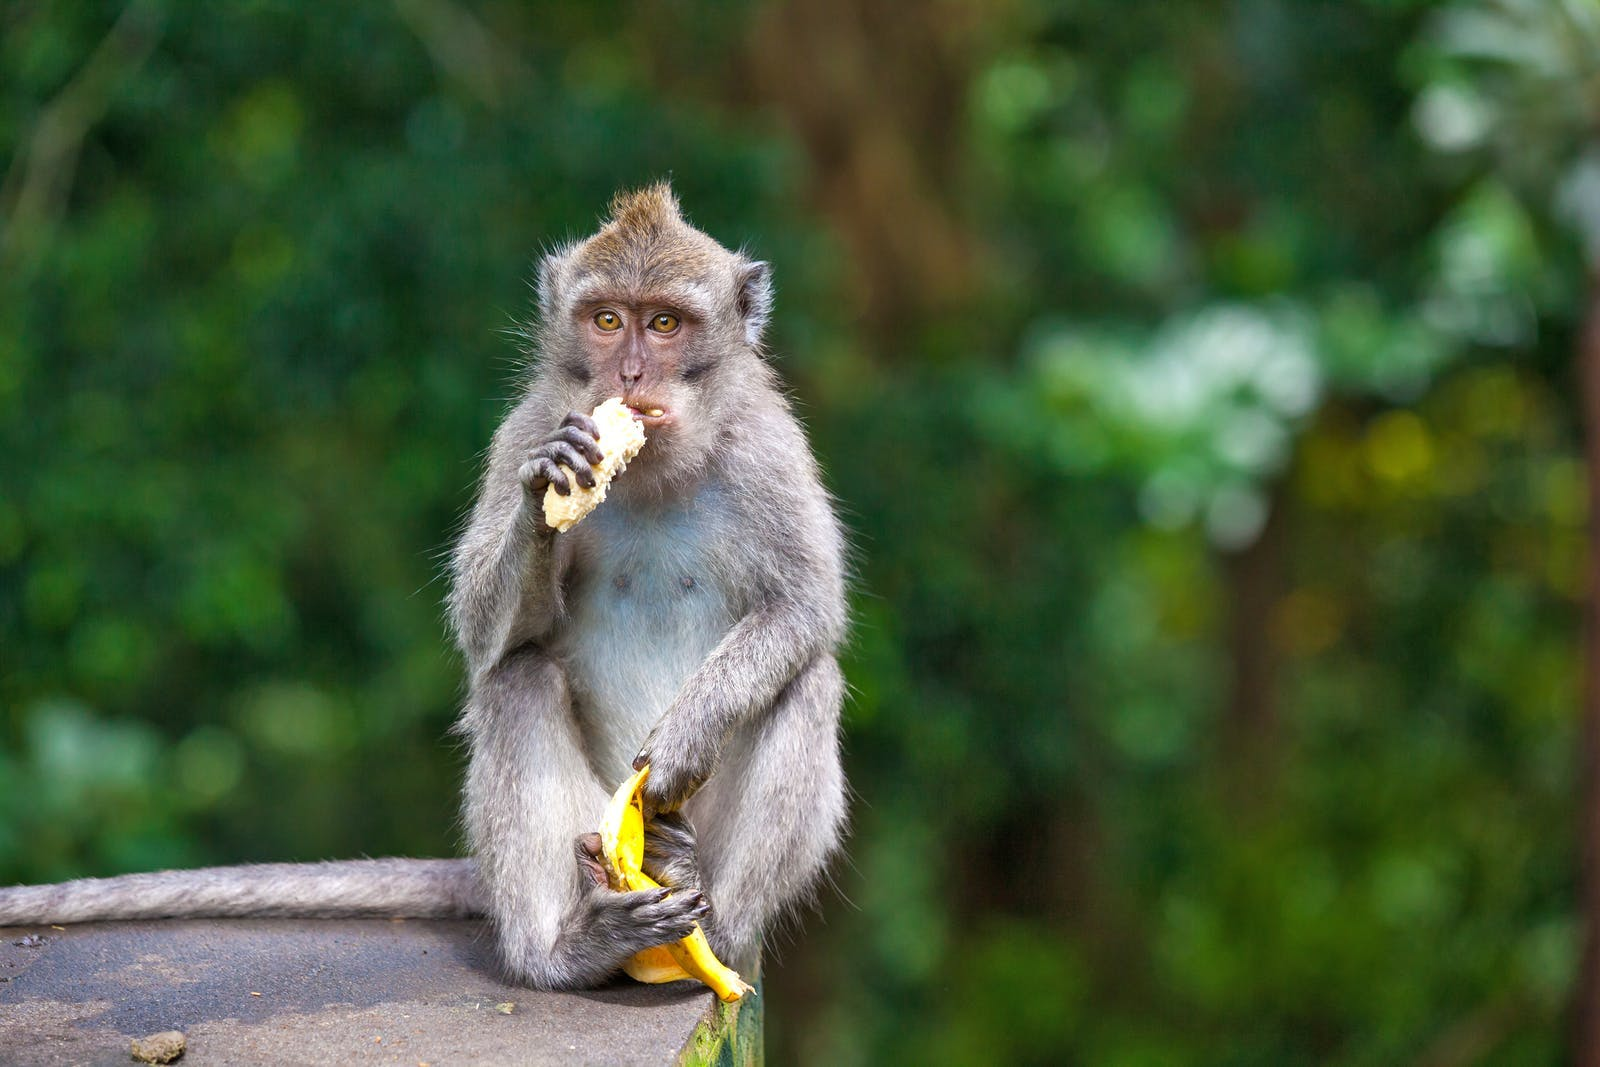 Cute monkeys lives in Ubud Monkey Forest, Bali, Indonesia.